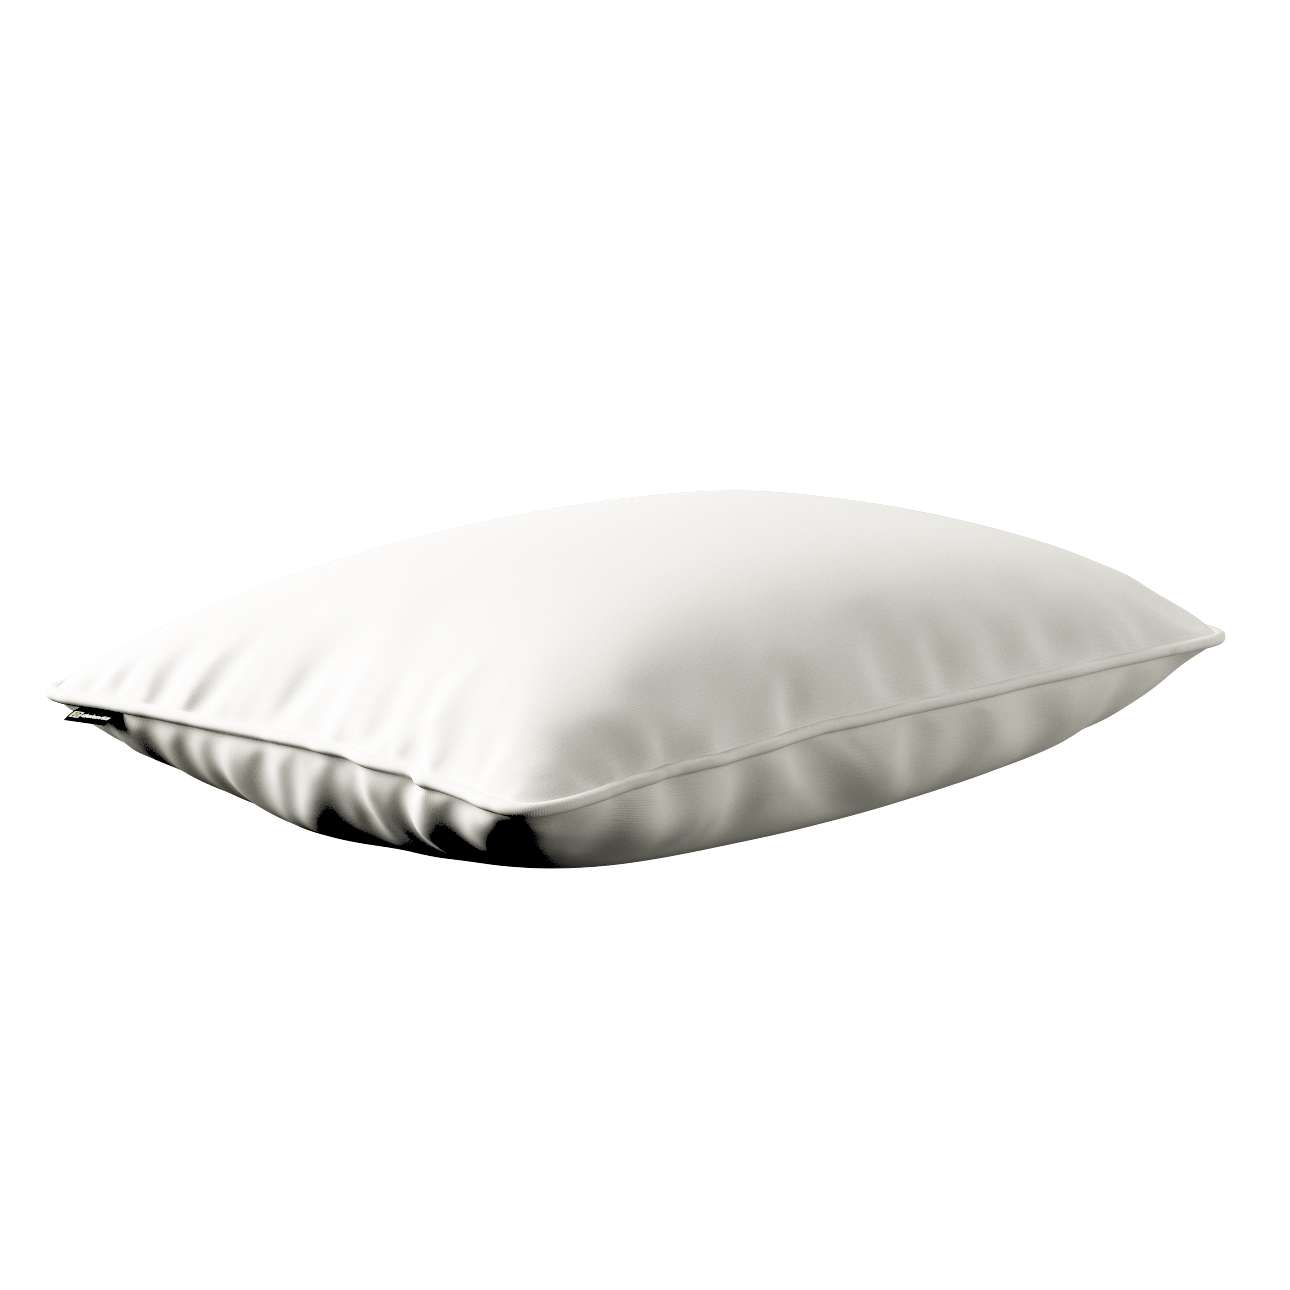 Kissenhülle Gabi mit Paspel 60x40cm 60 x 40 cm von der Kollektion Cotton Panama, Stoff: 702-34